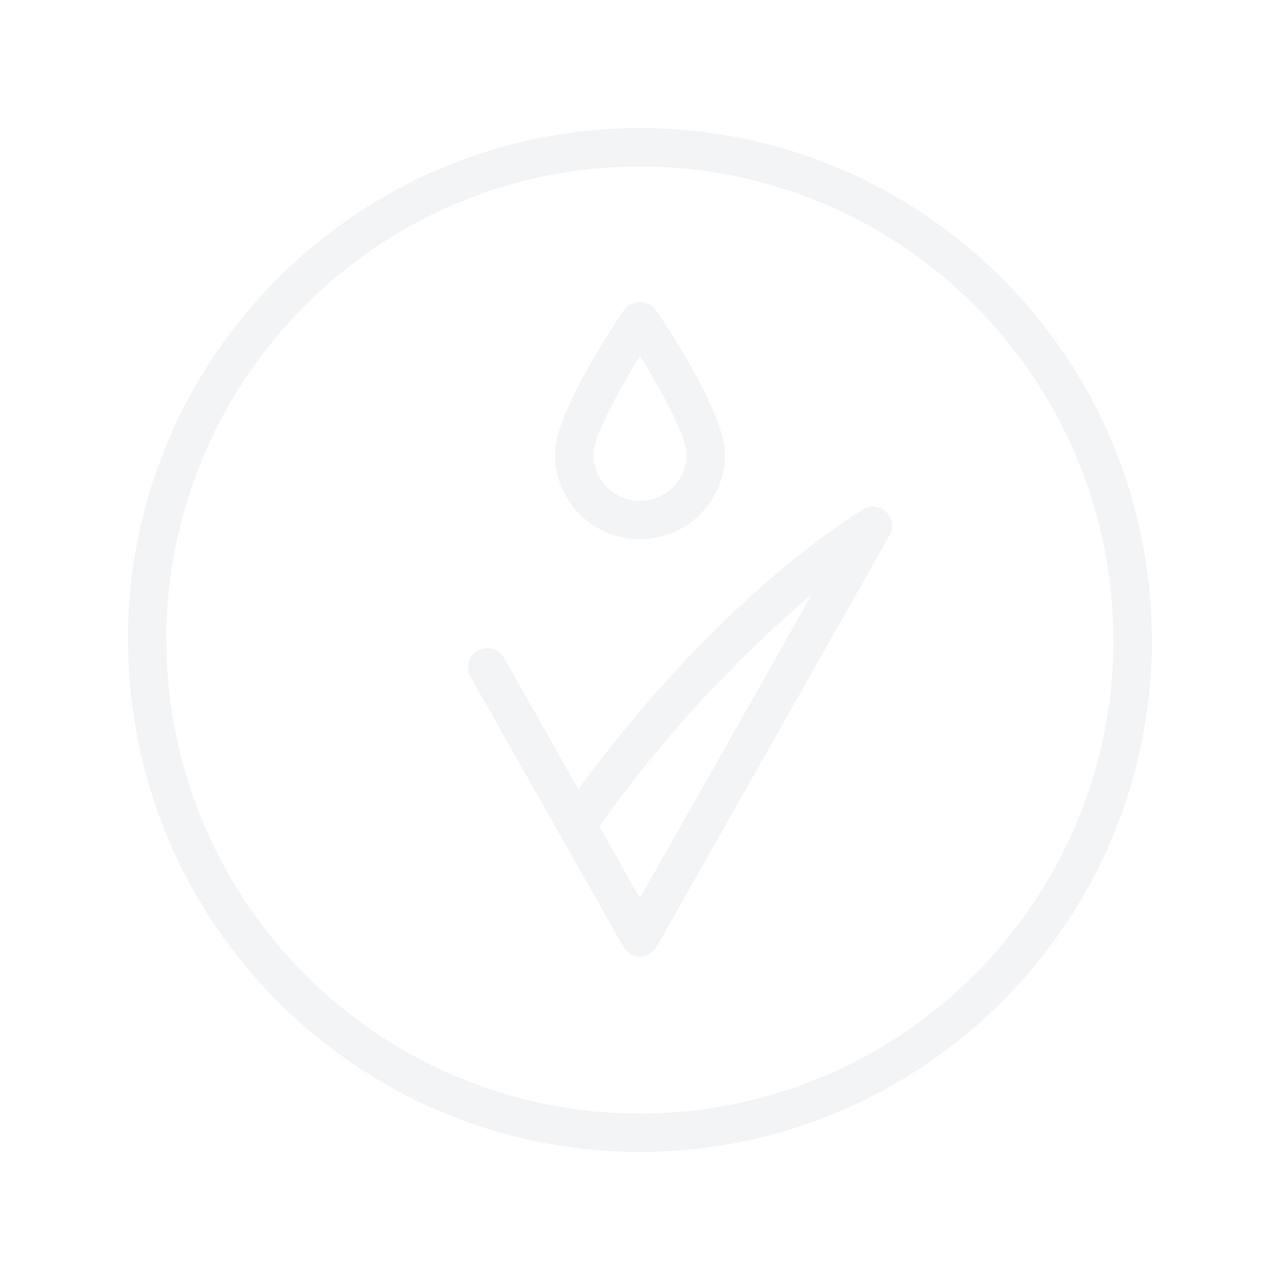 Moschino Cheap & Chic I Love Love 30ml Eau De Toilette Gift Set